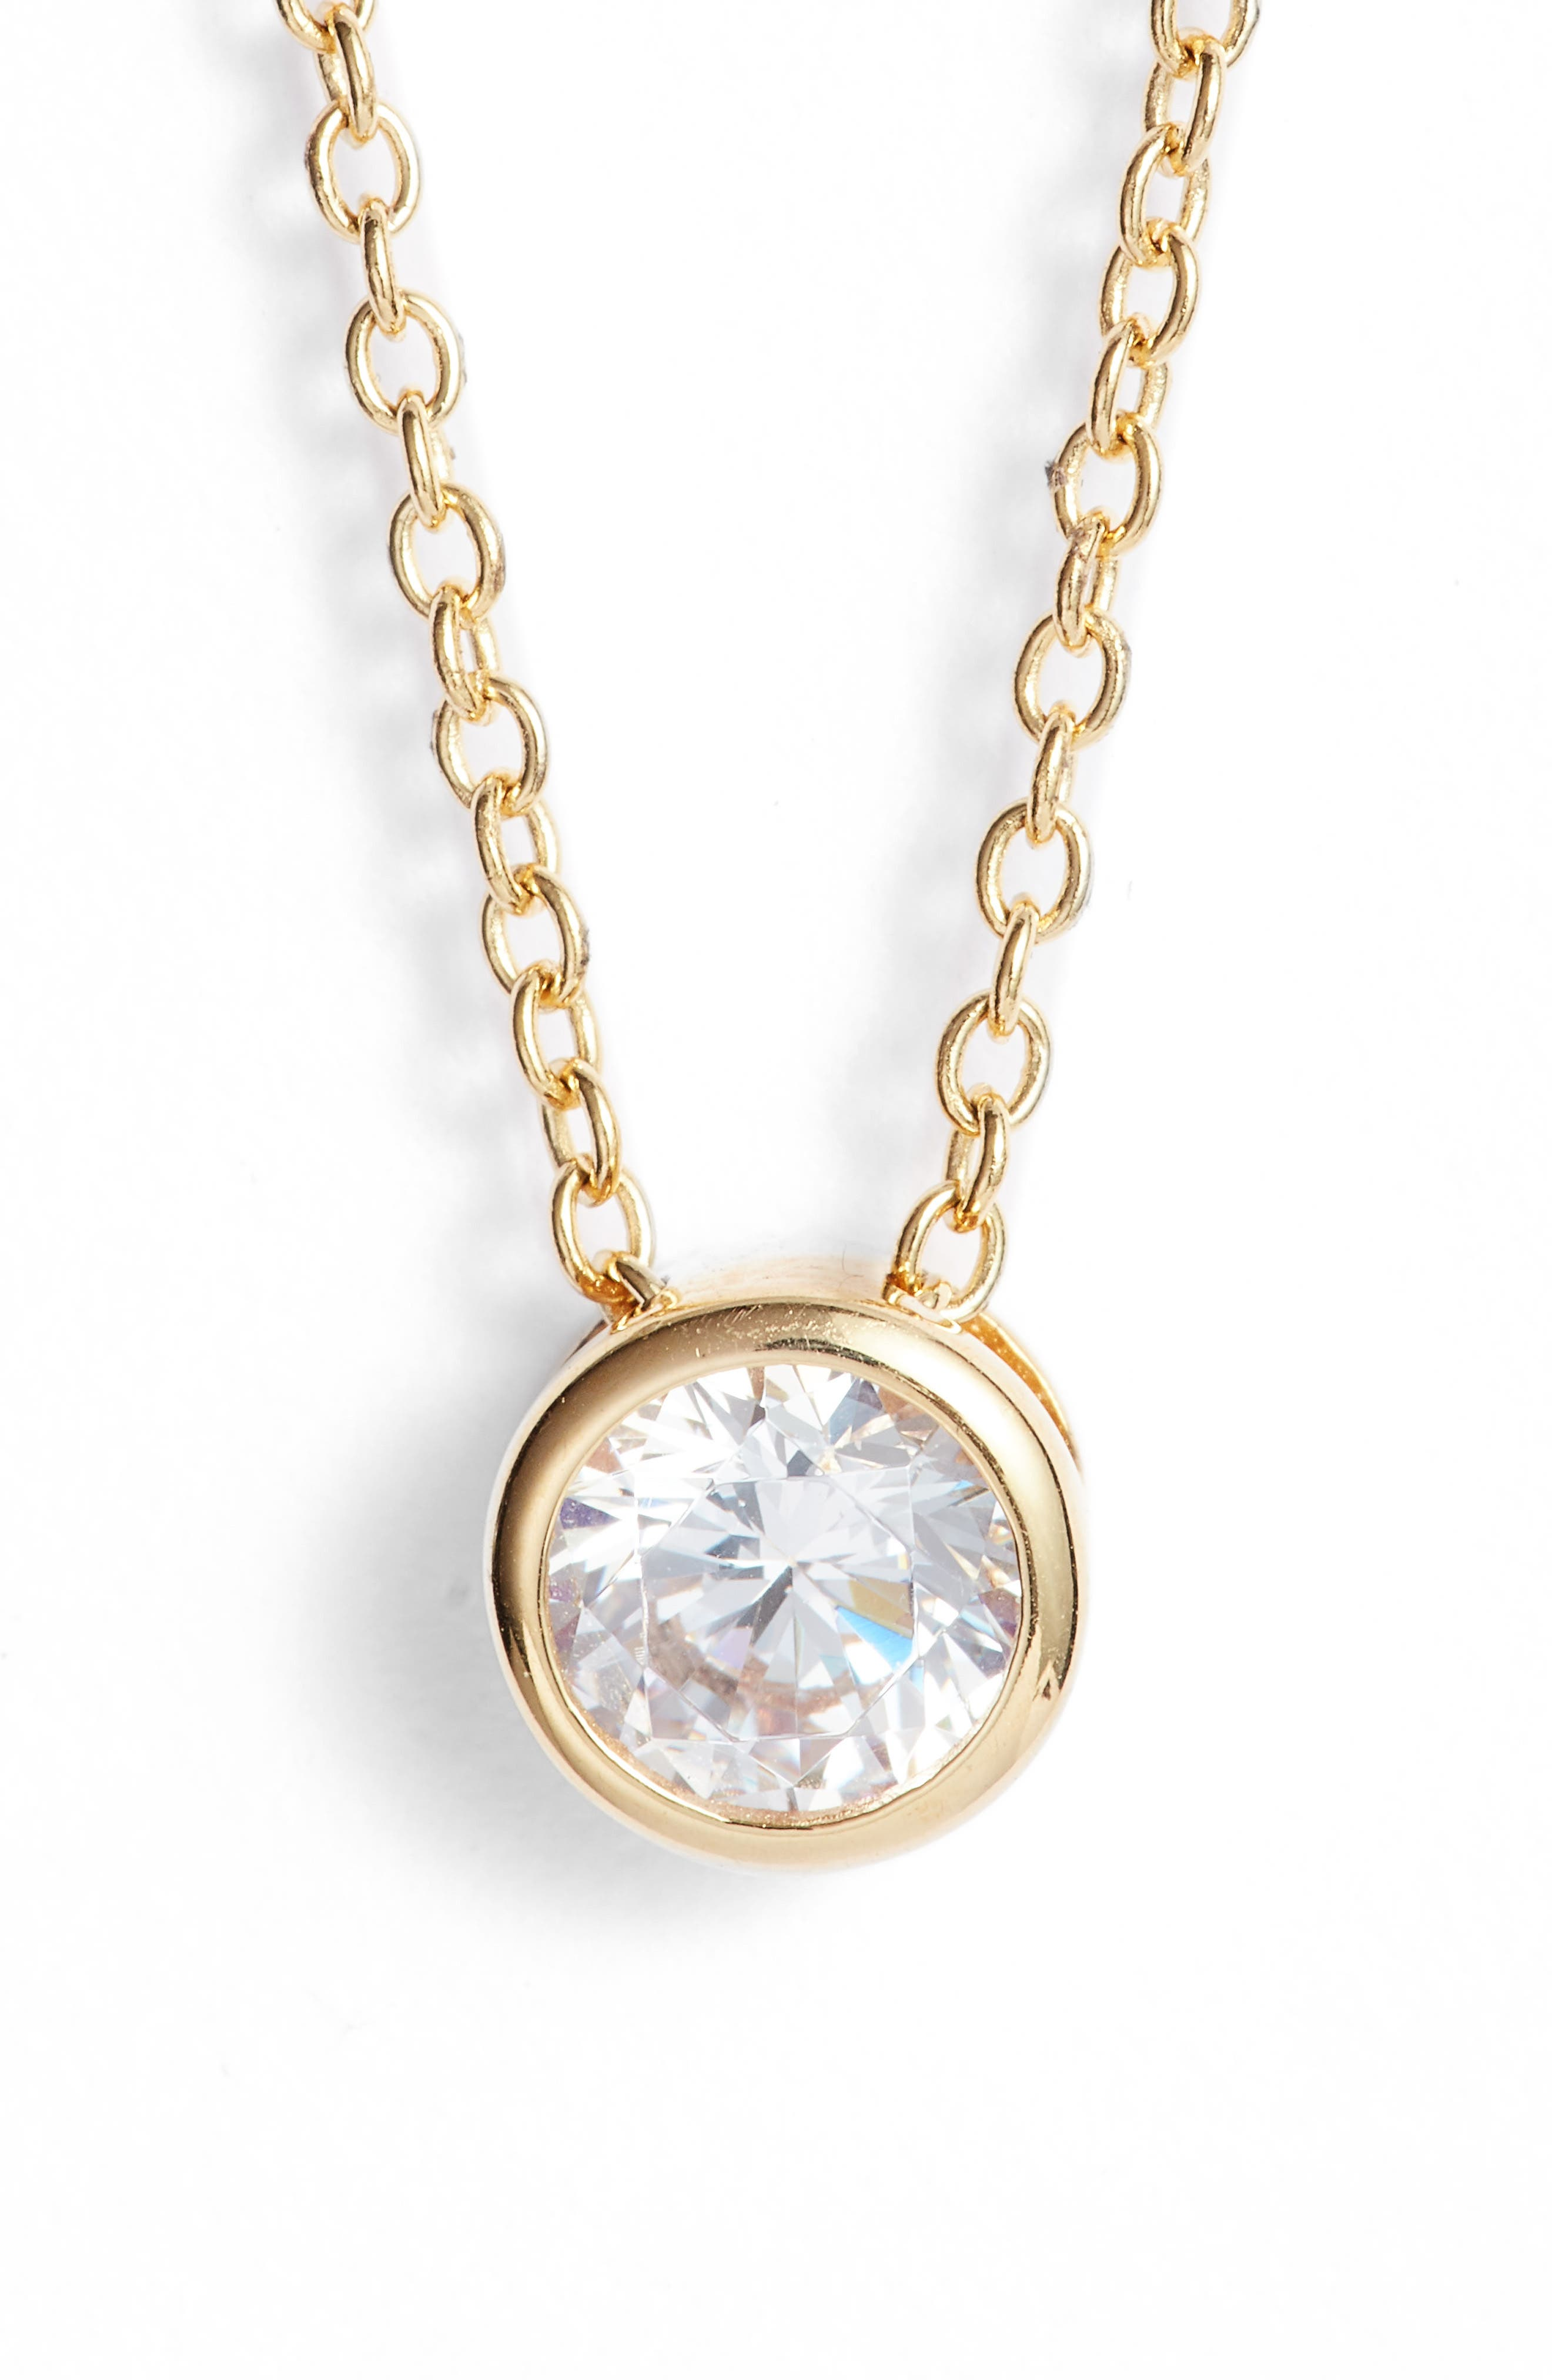 NORDSTROM 0.5 ct tw Cubic Zirconia Pendant Necklace, Main, color, GOLD